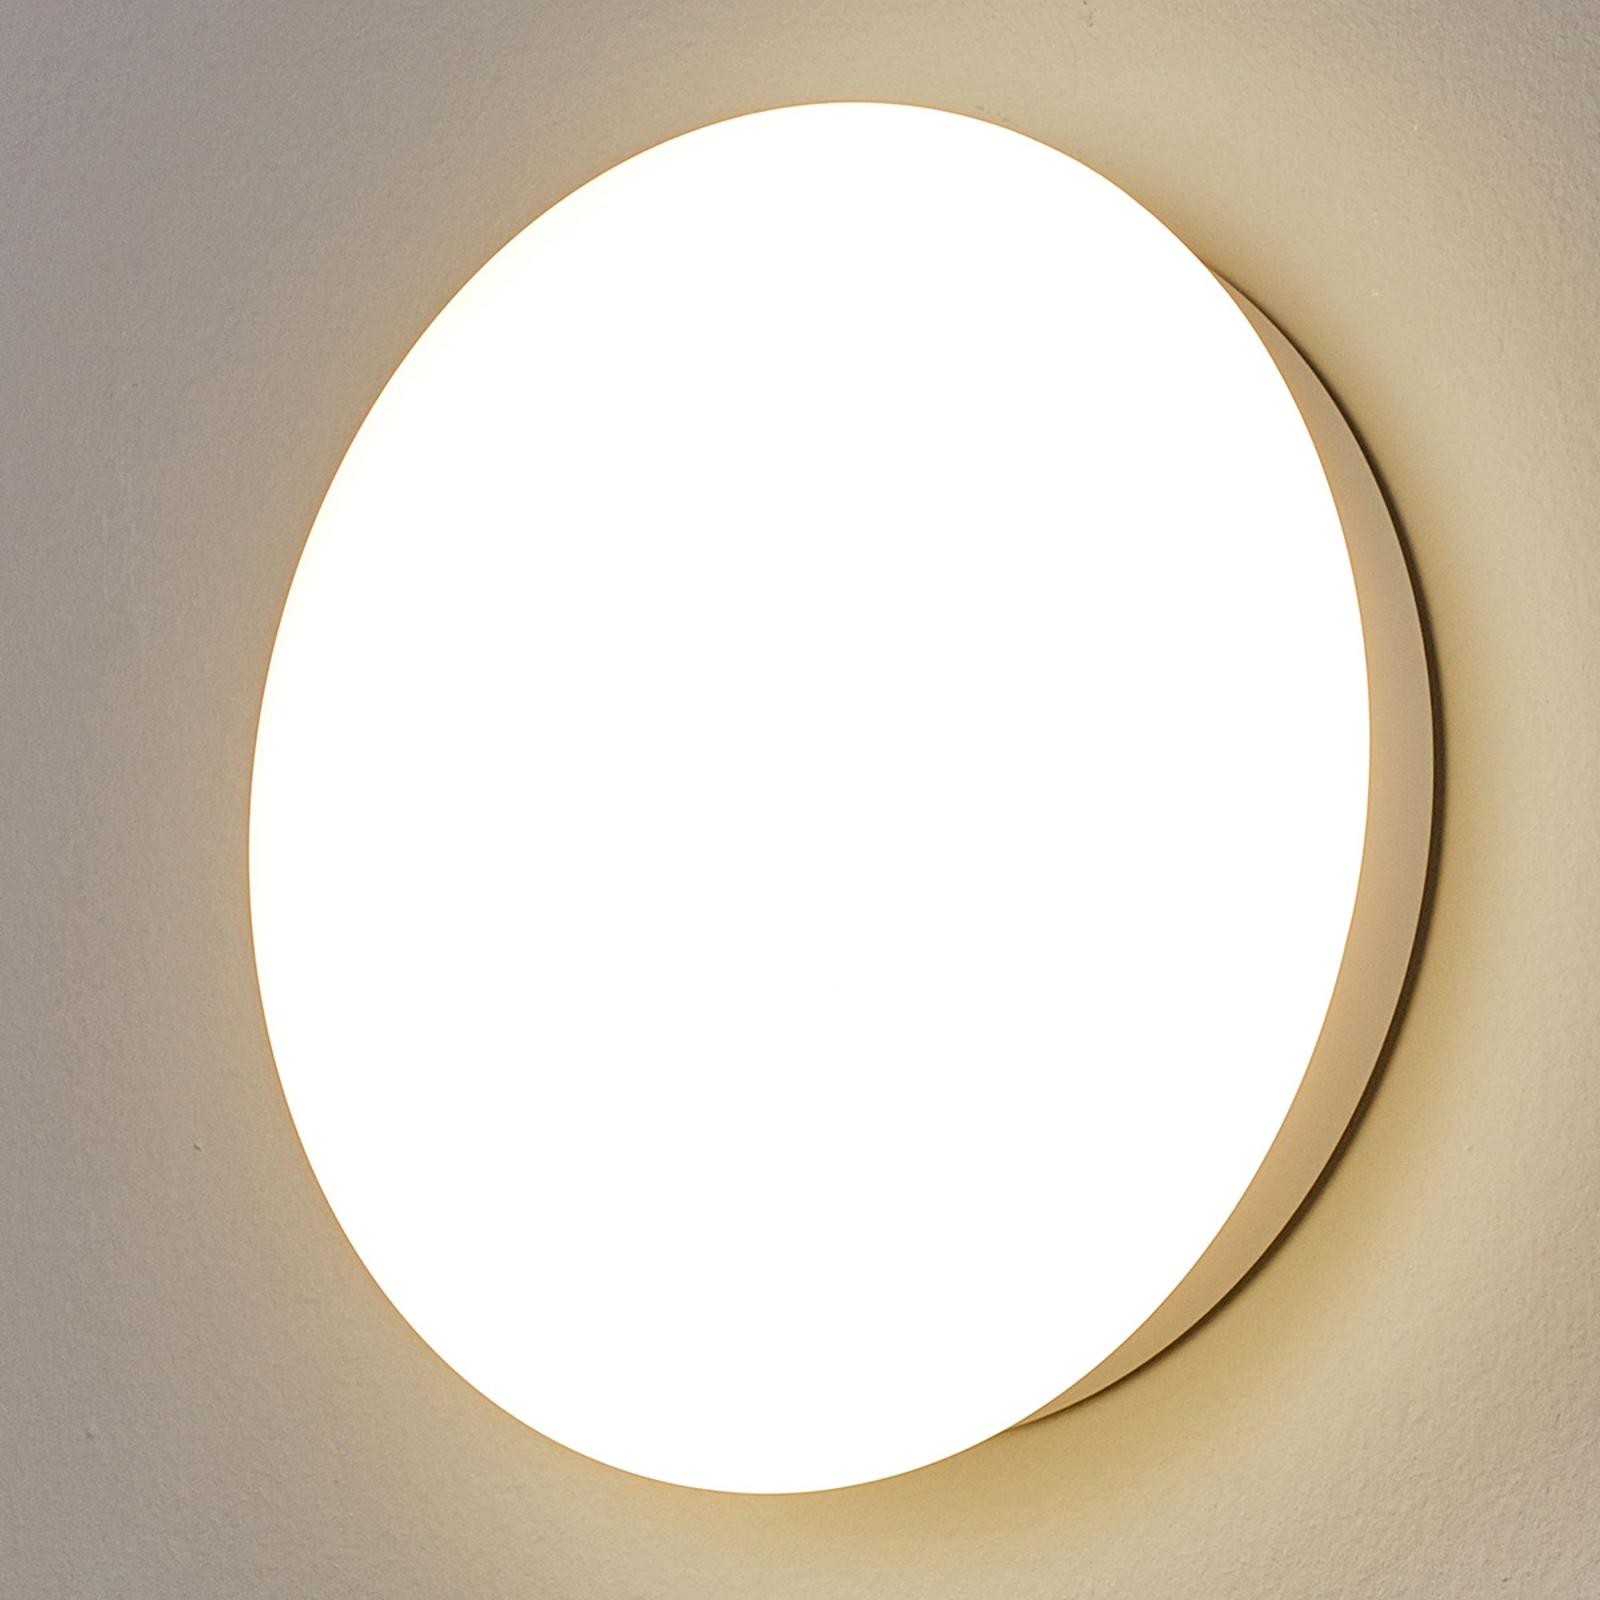 SUN 12 LED-væglampe IP55 13 W 3000 K varm hvid